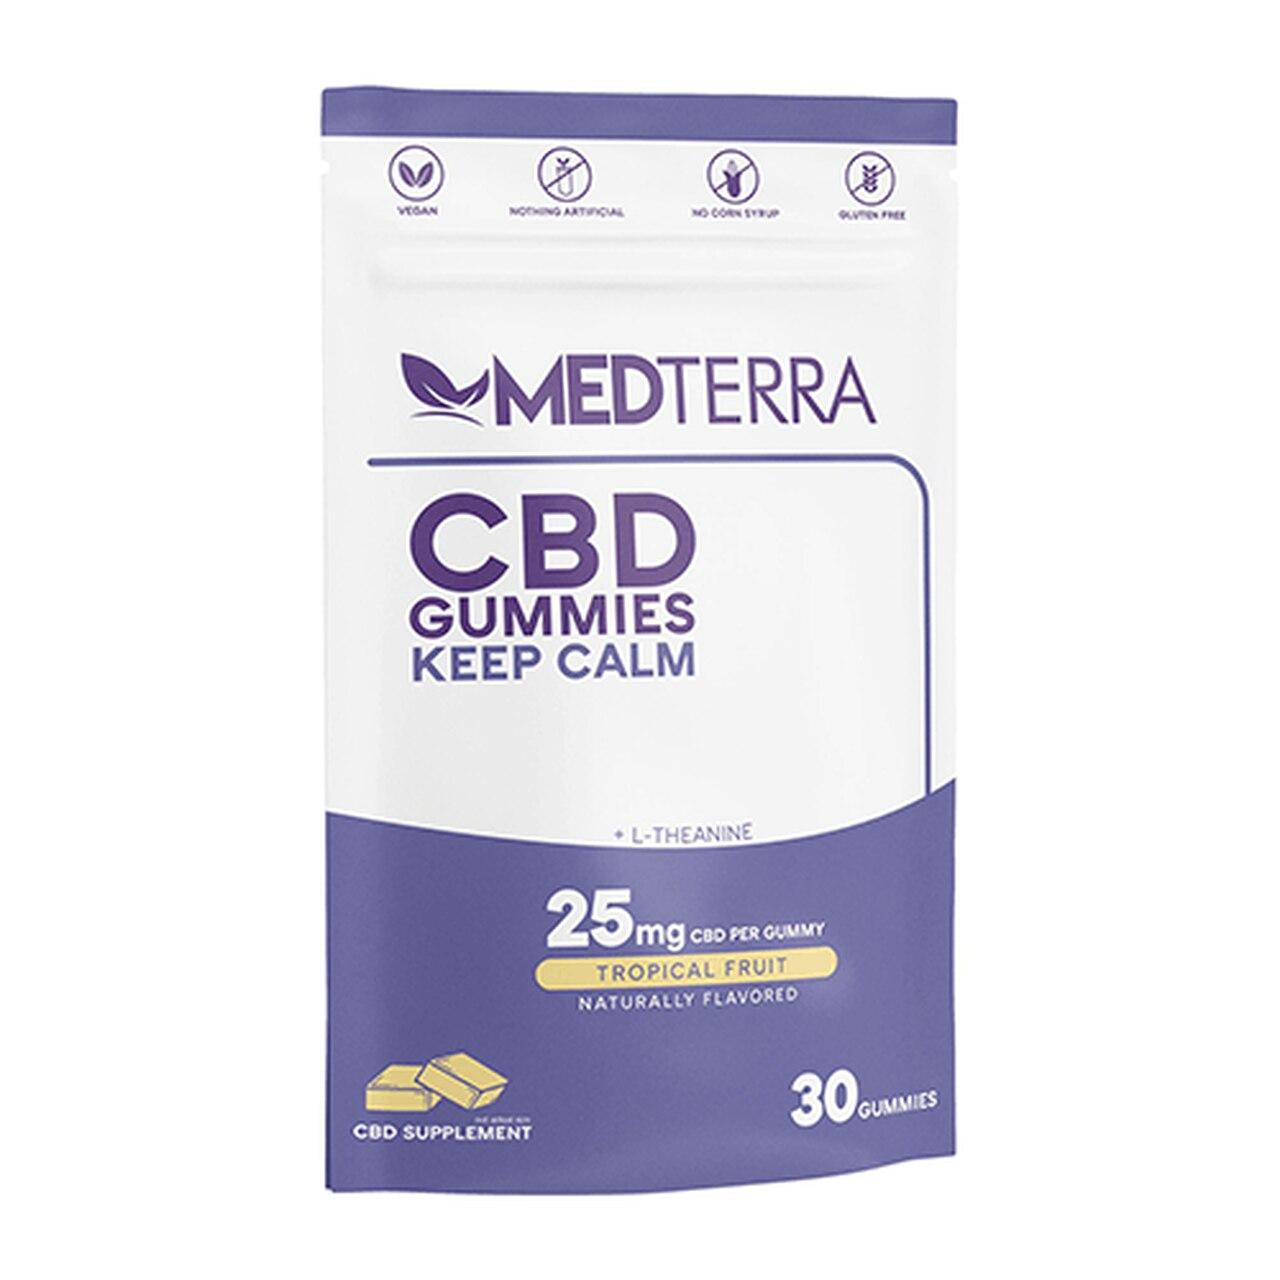 Medterra Keep Calm Tropical Fruit Isolate Gummies